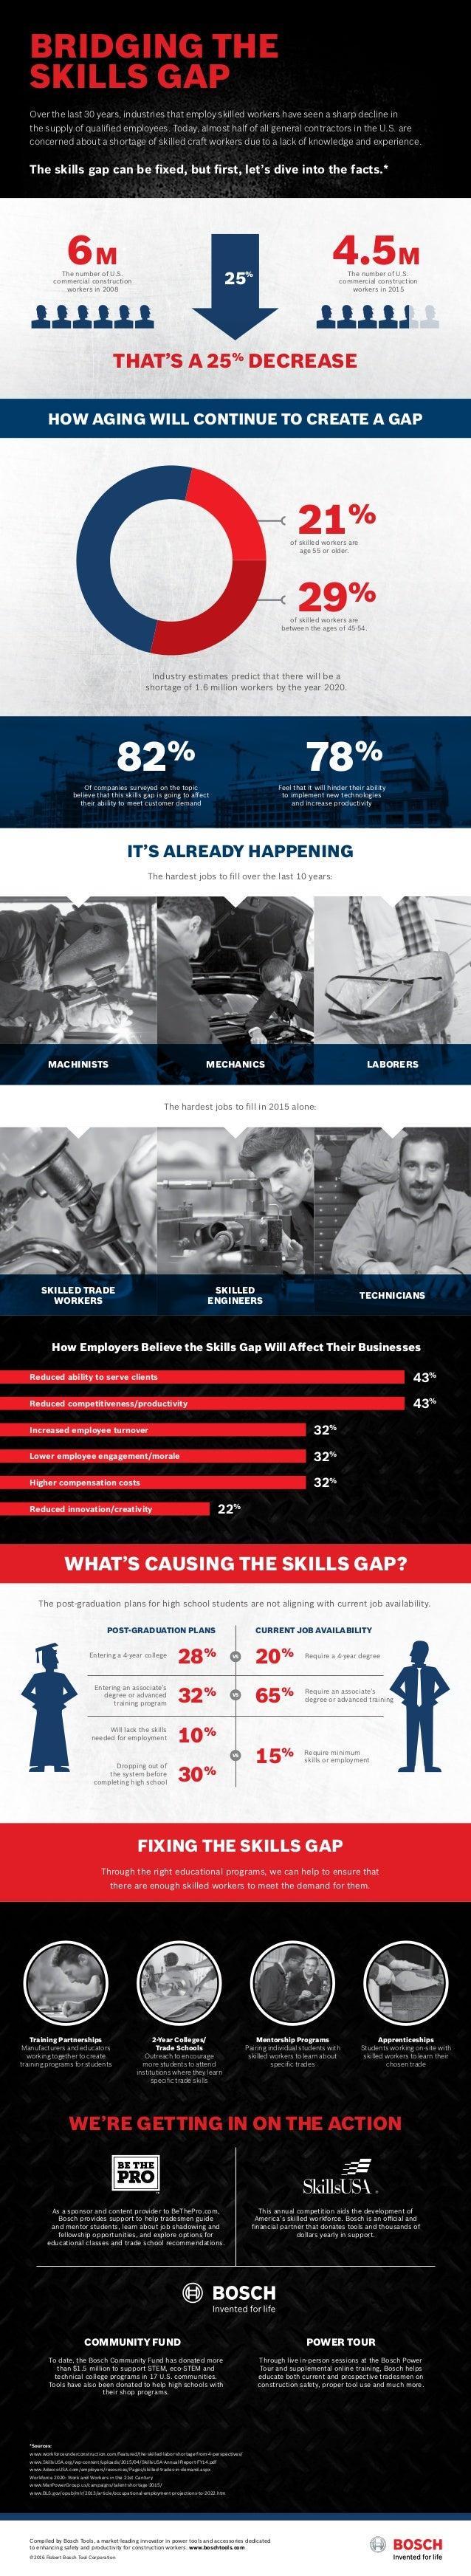 Bosch Tools Construction Trade Skills Gap Infographic